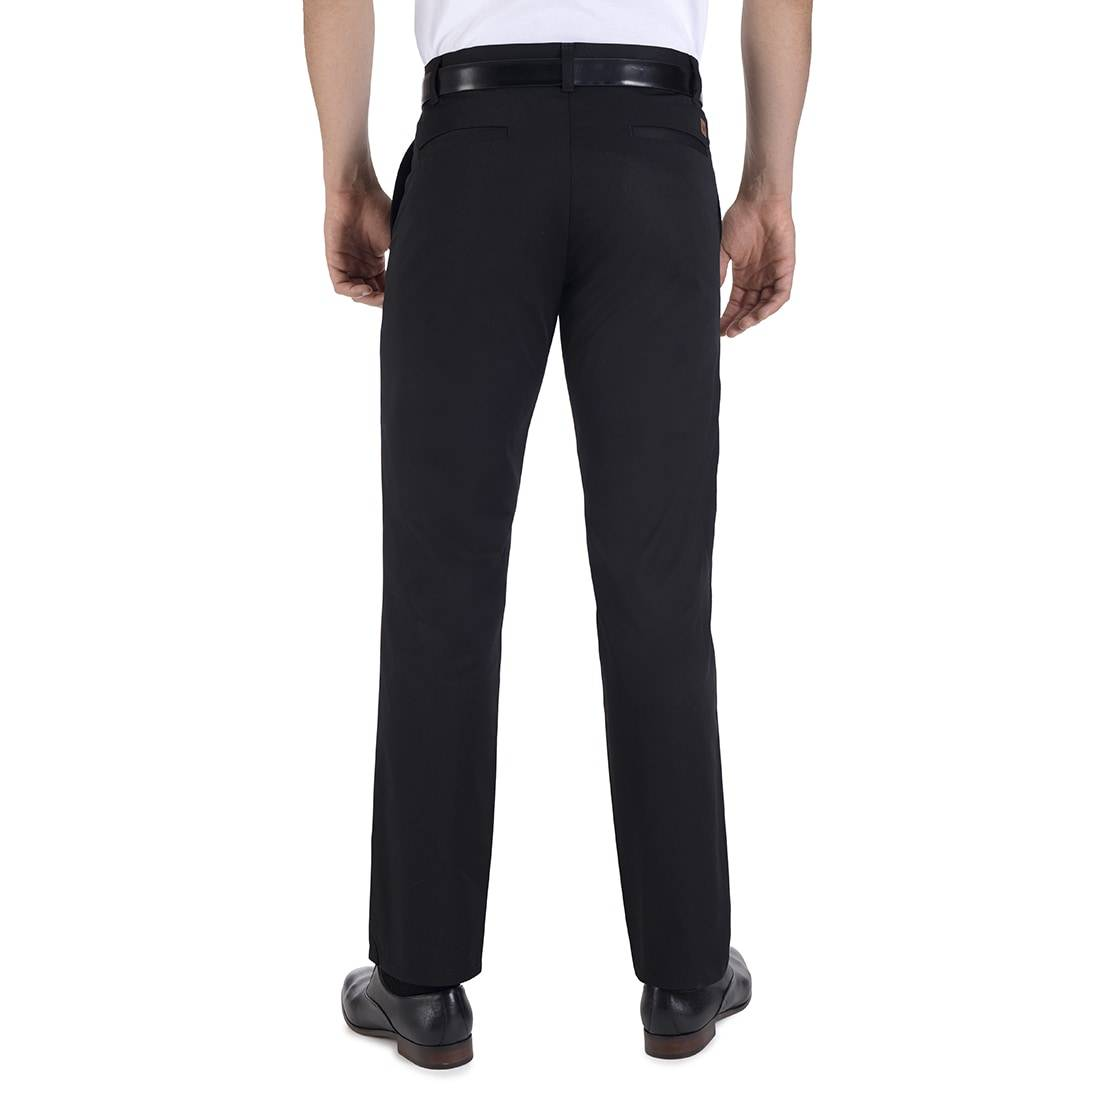 010920418909-02-Pantalon-Casual-Slim-Fit-Negro-yale